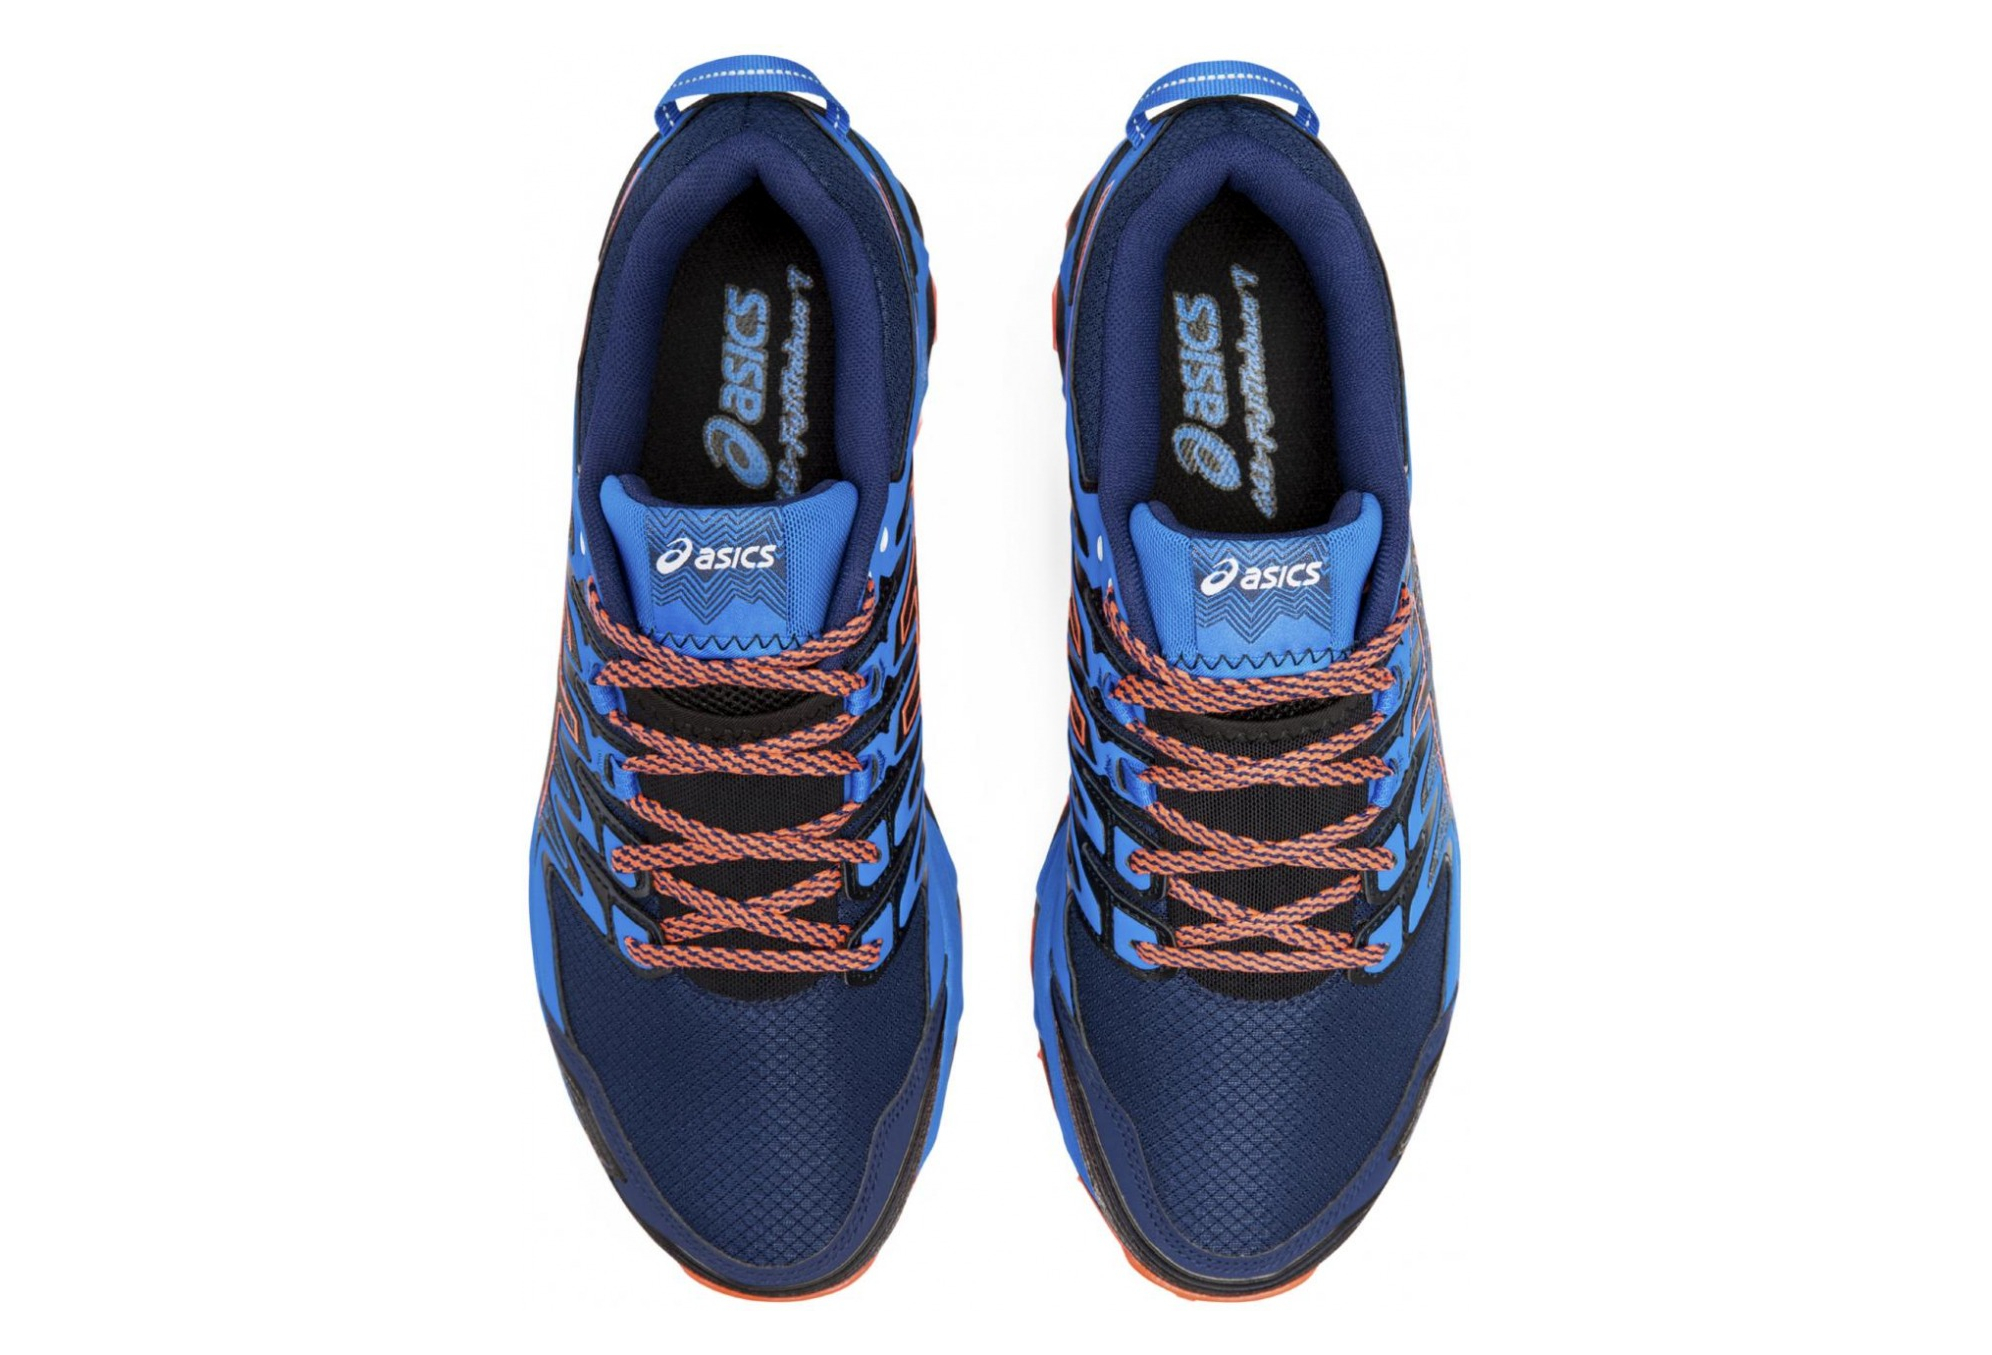 Pointes d'athlétisme Adidas Multi Tech 2 J Race Blue Silver